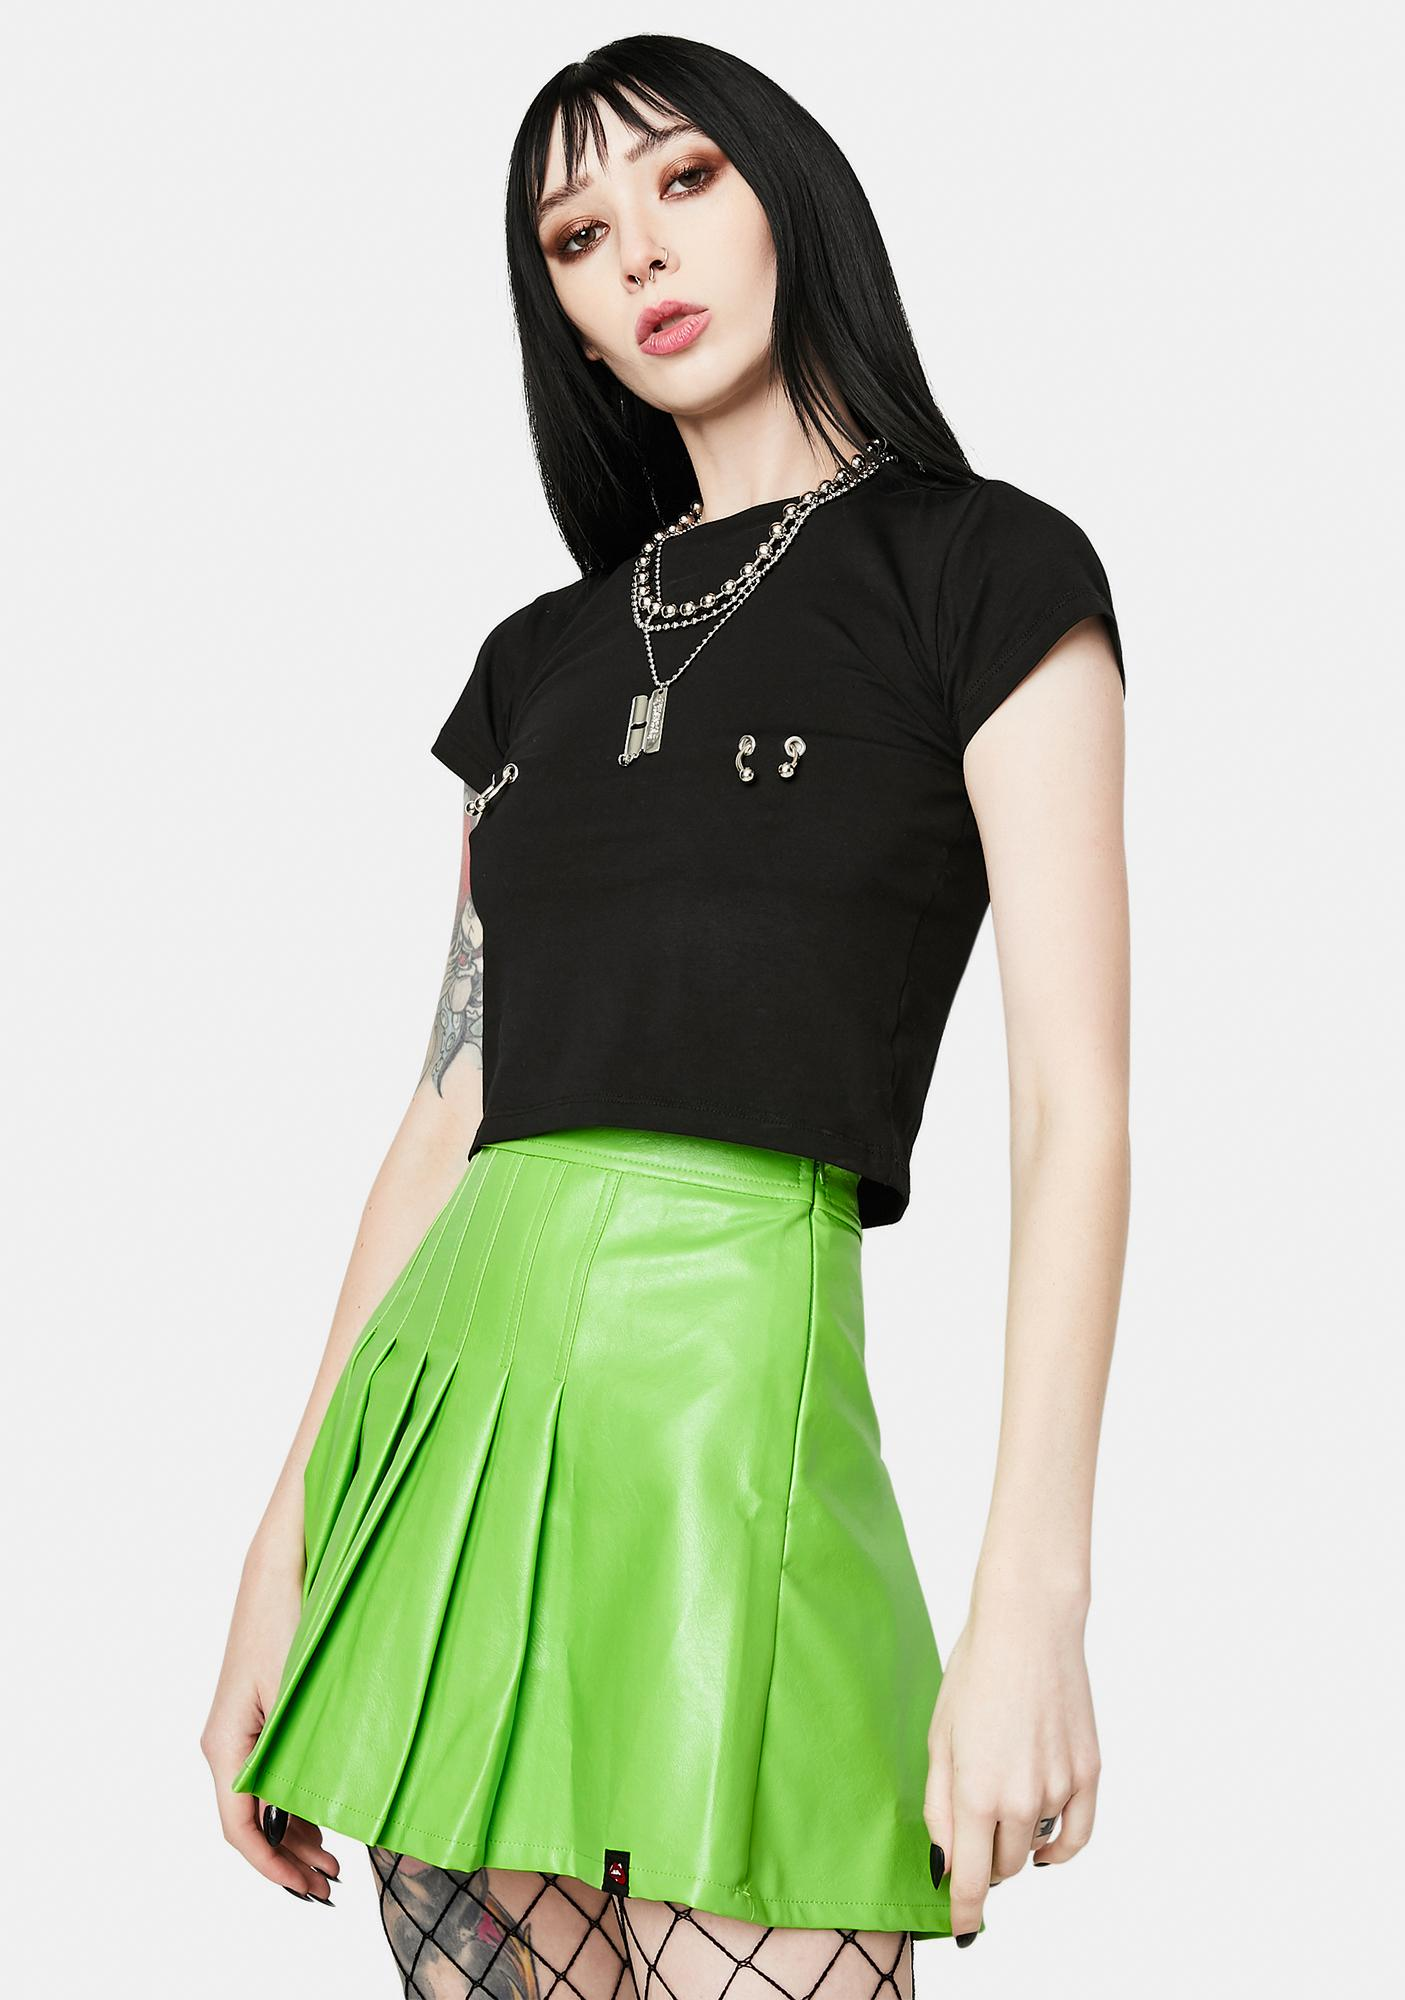 Alice's Lips School Neon Green Vegan Leather Pleated Skirt